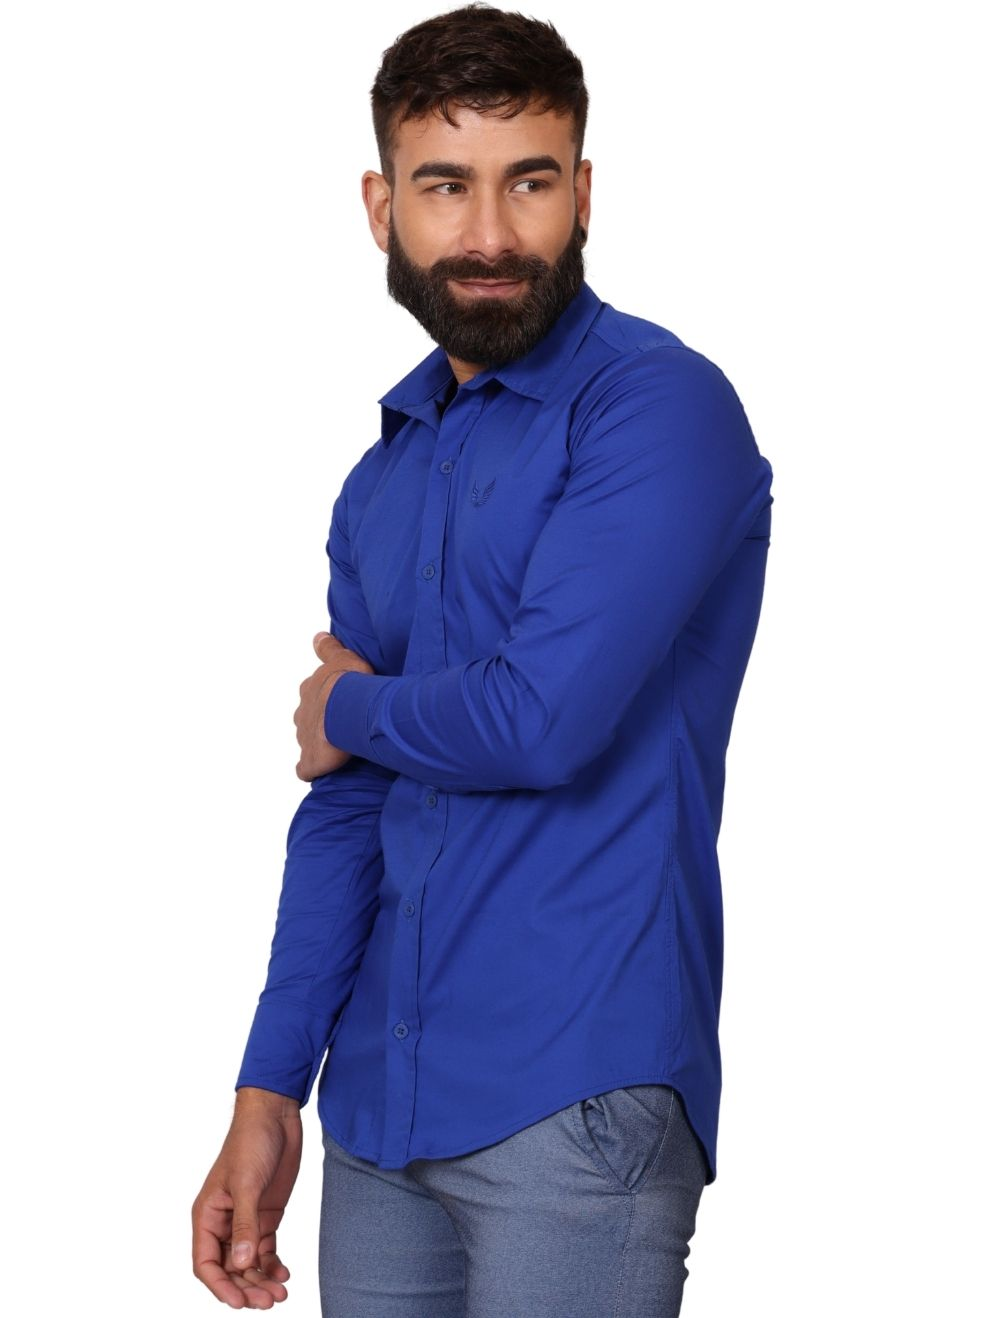 Camisa Masculina Slim Manga Longa com Elastano Azul Royal